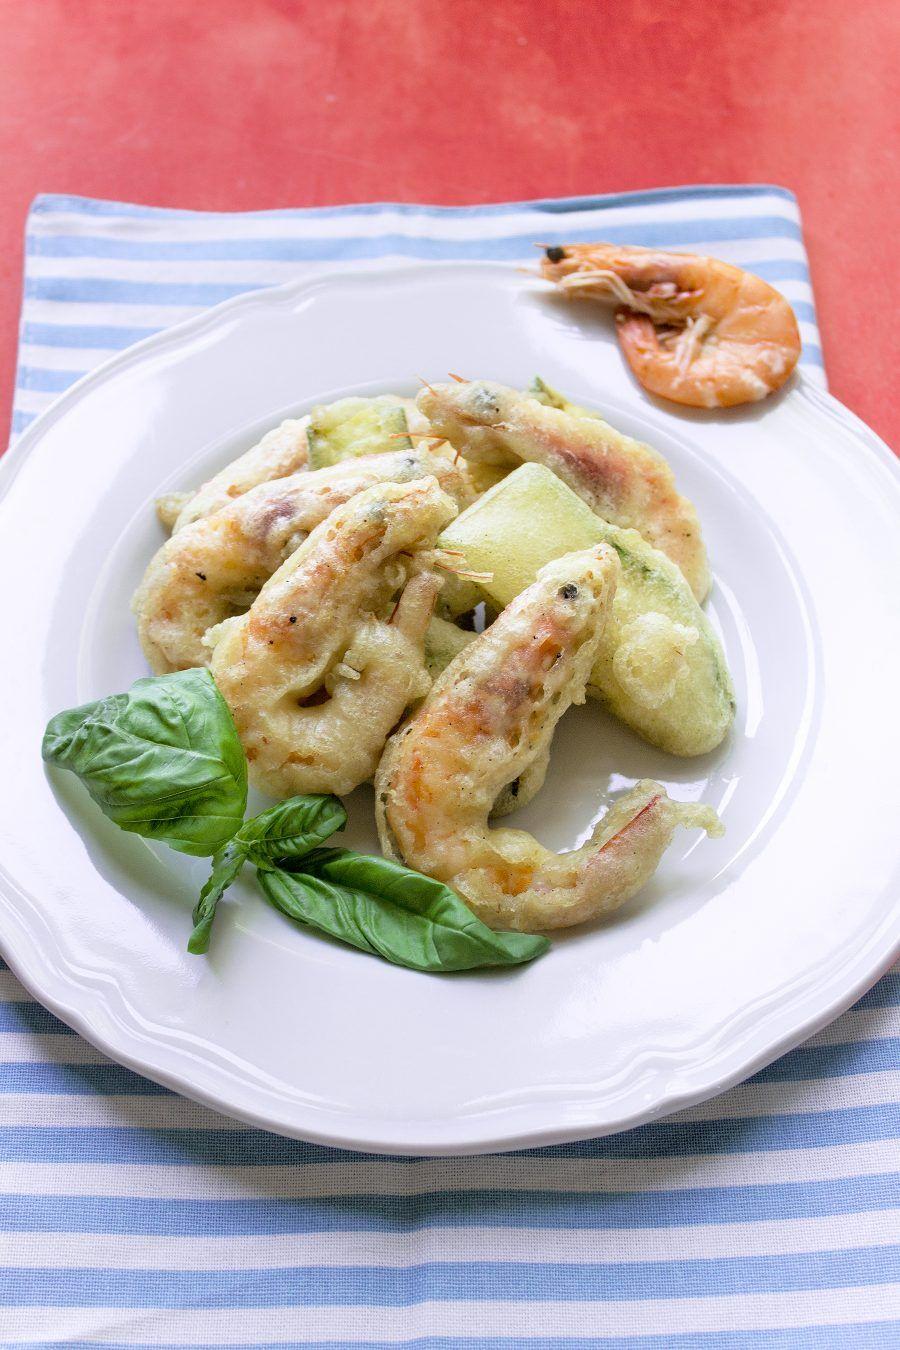 tempura-di-gamberetti-zucchine-4-contemporaneo-food